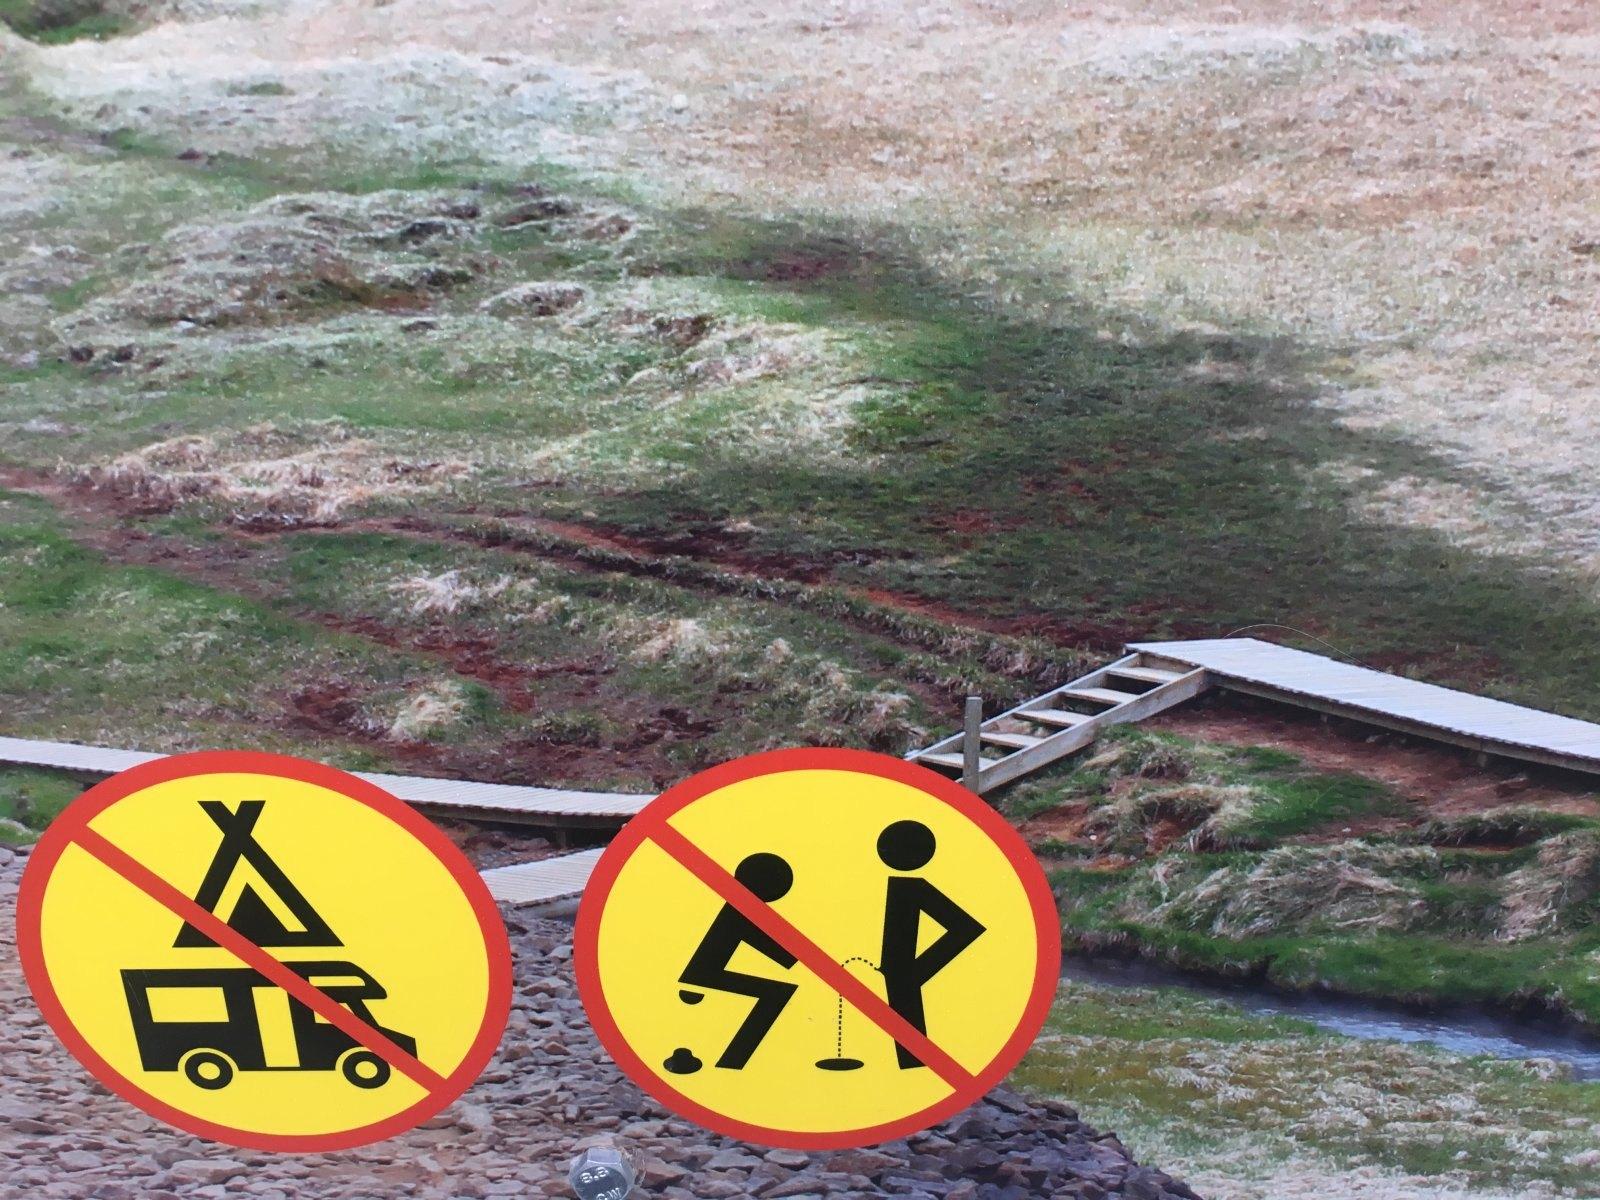 снова проблема туалетов в Исландии, фото Стасмир, Photo Stasmir